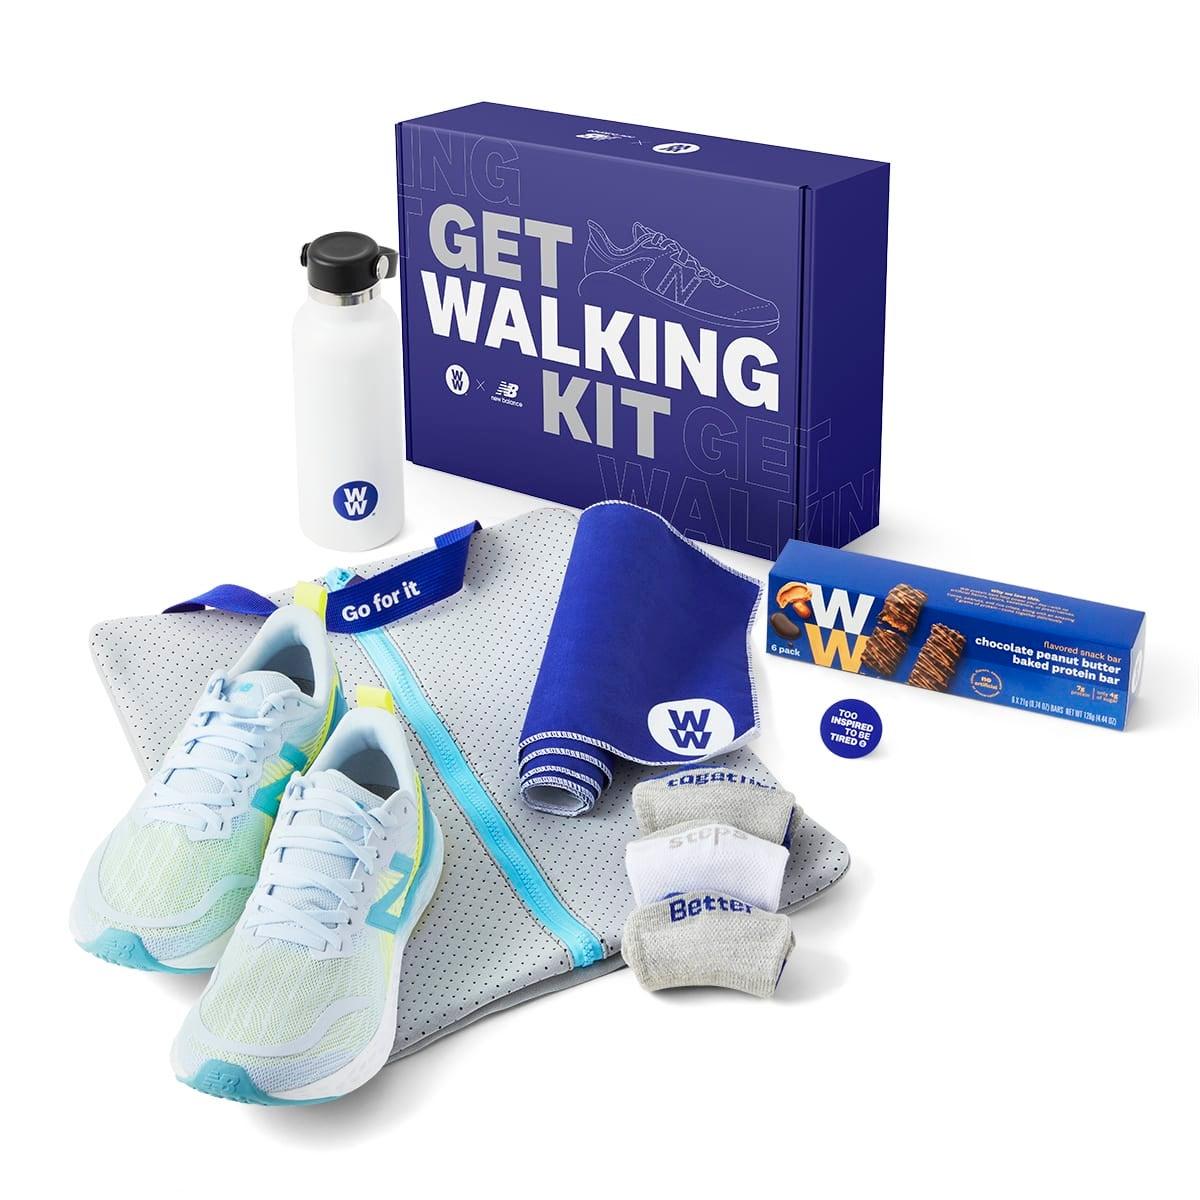 WW x New Balance Get Walking Kit